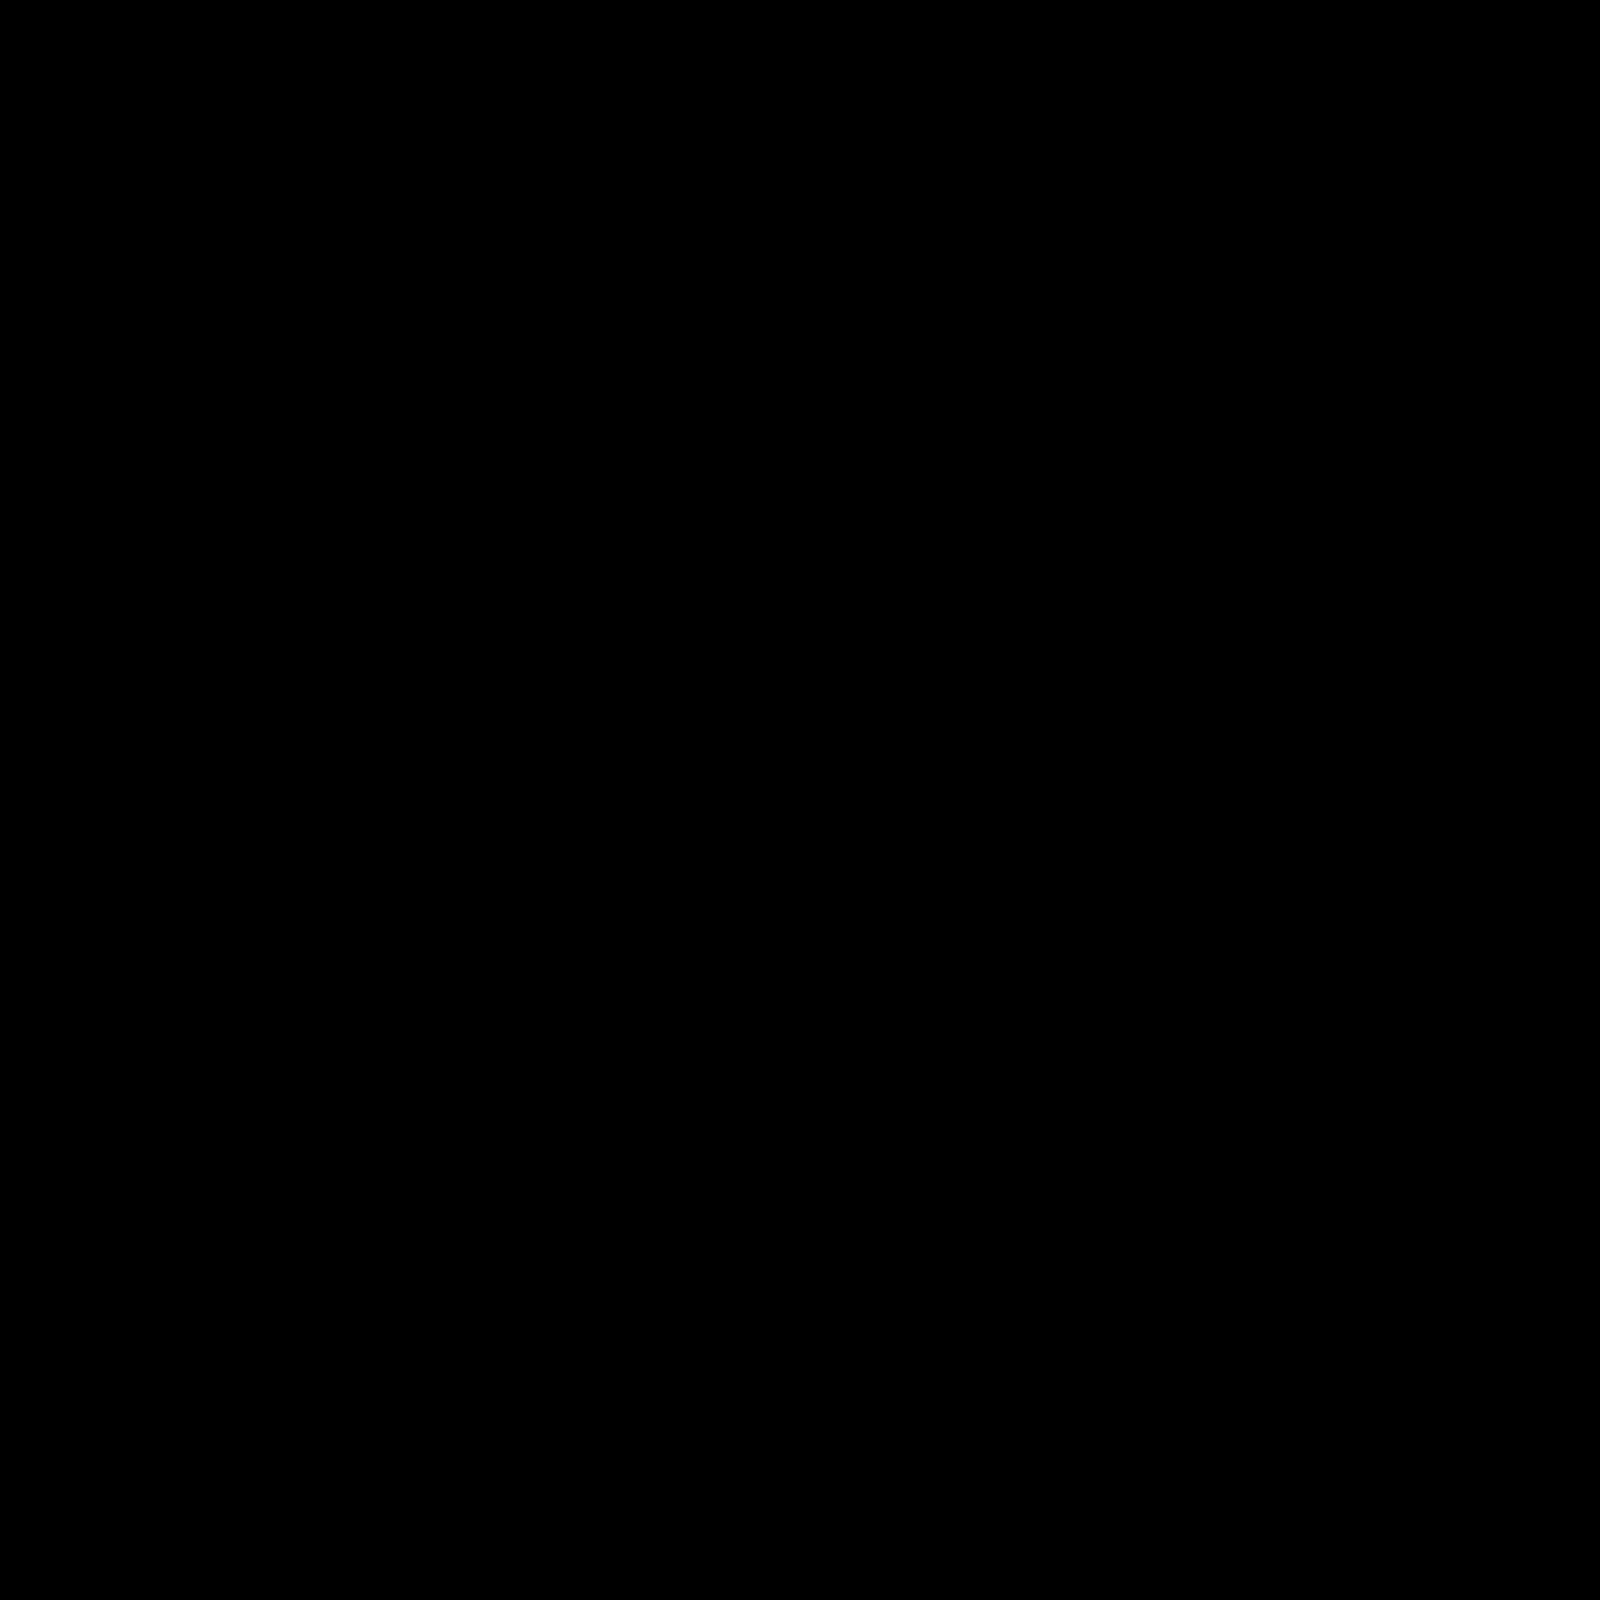 SKq9yH-black-and-white-instagram-logo-png - vox europae